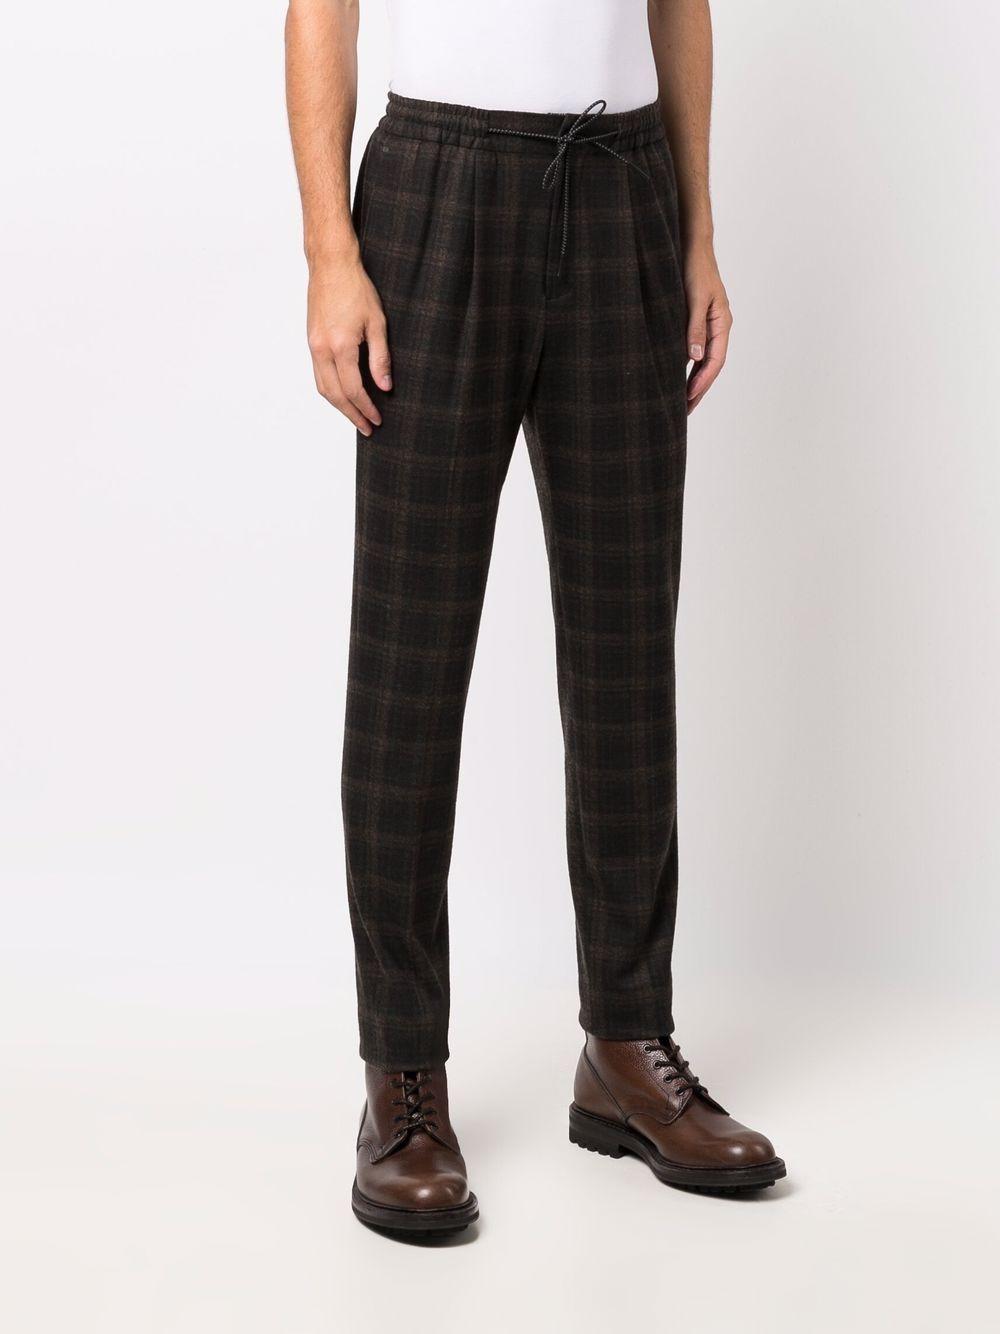 Dark-brown slim-fit checked trousers  MANUEL RITZ |  | 3132P5005-21368830